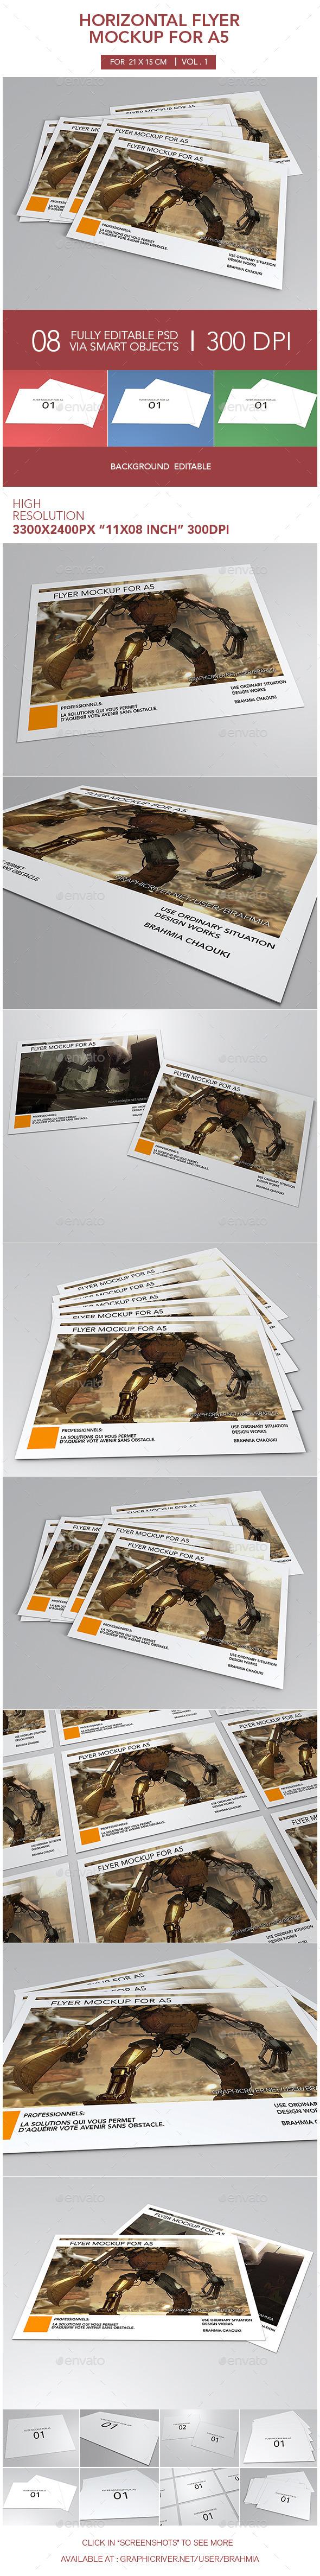 Horizontal Flyer Mockup for A5 - Flyers Print